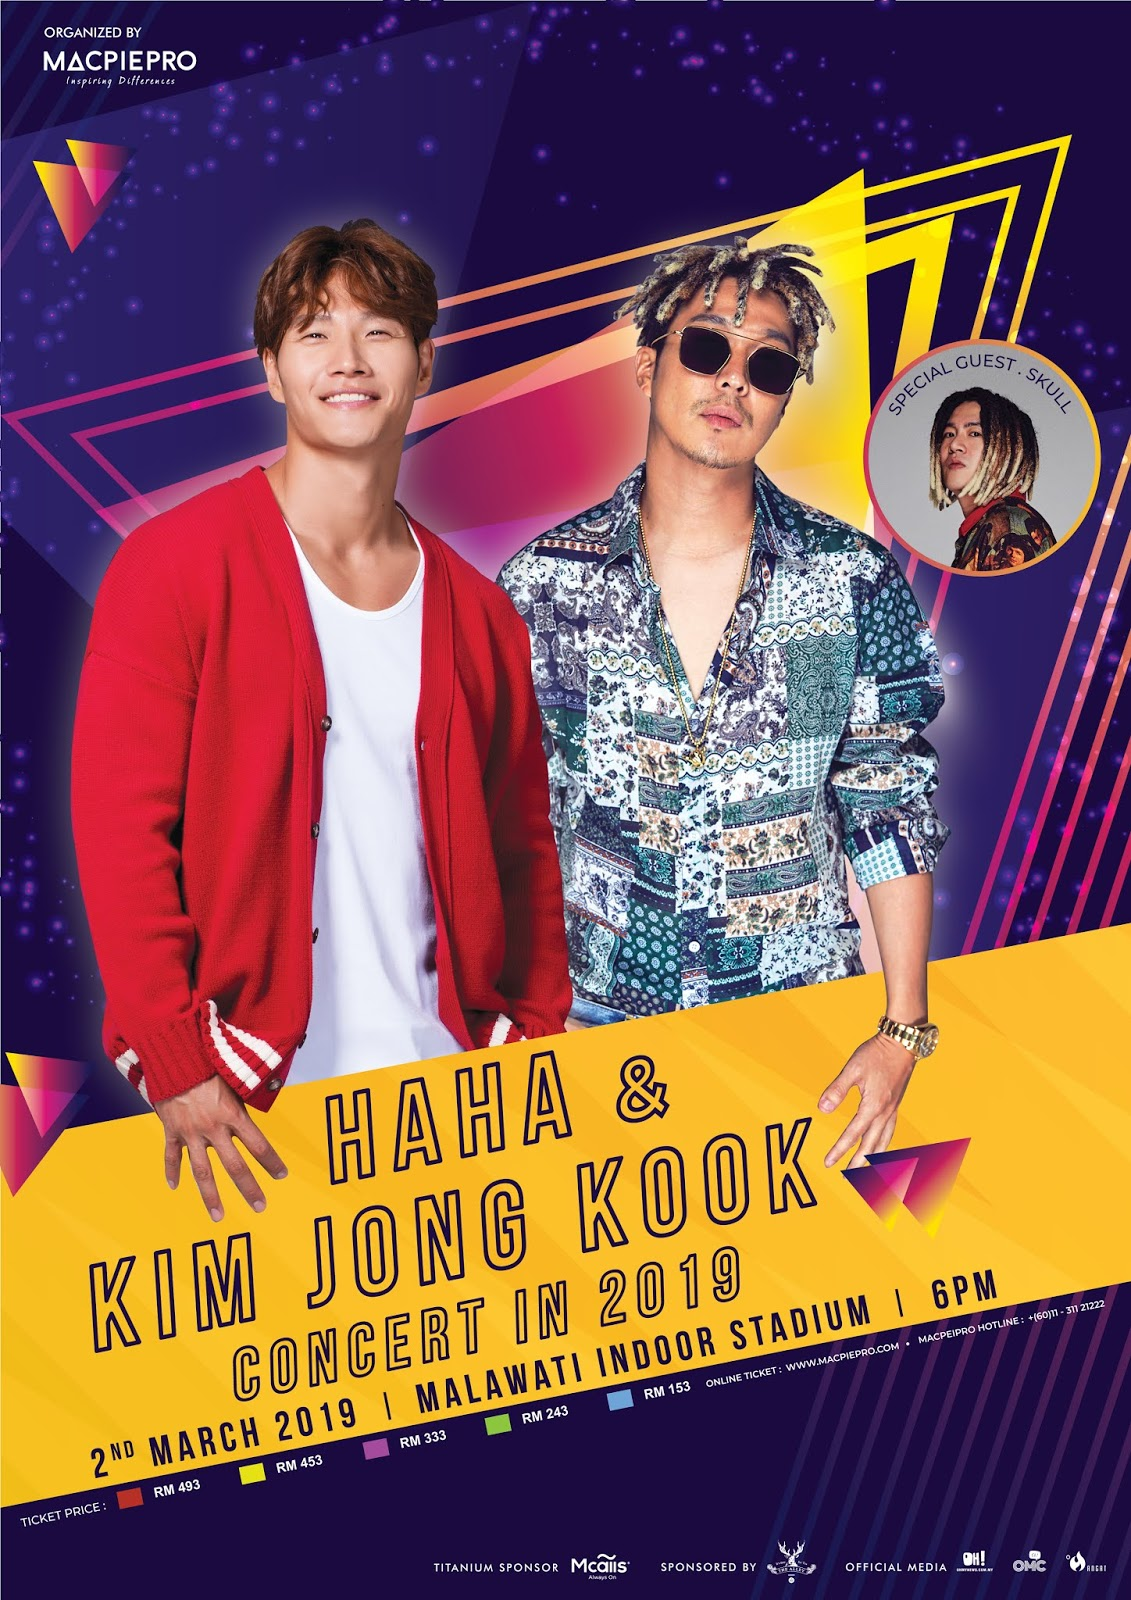 MACPIEPRO CRAZY 20 ANJUR HAHA & KIM JONG KOOK CONCERT IN 2019 DI MALAYSIA